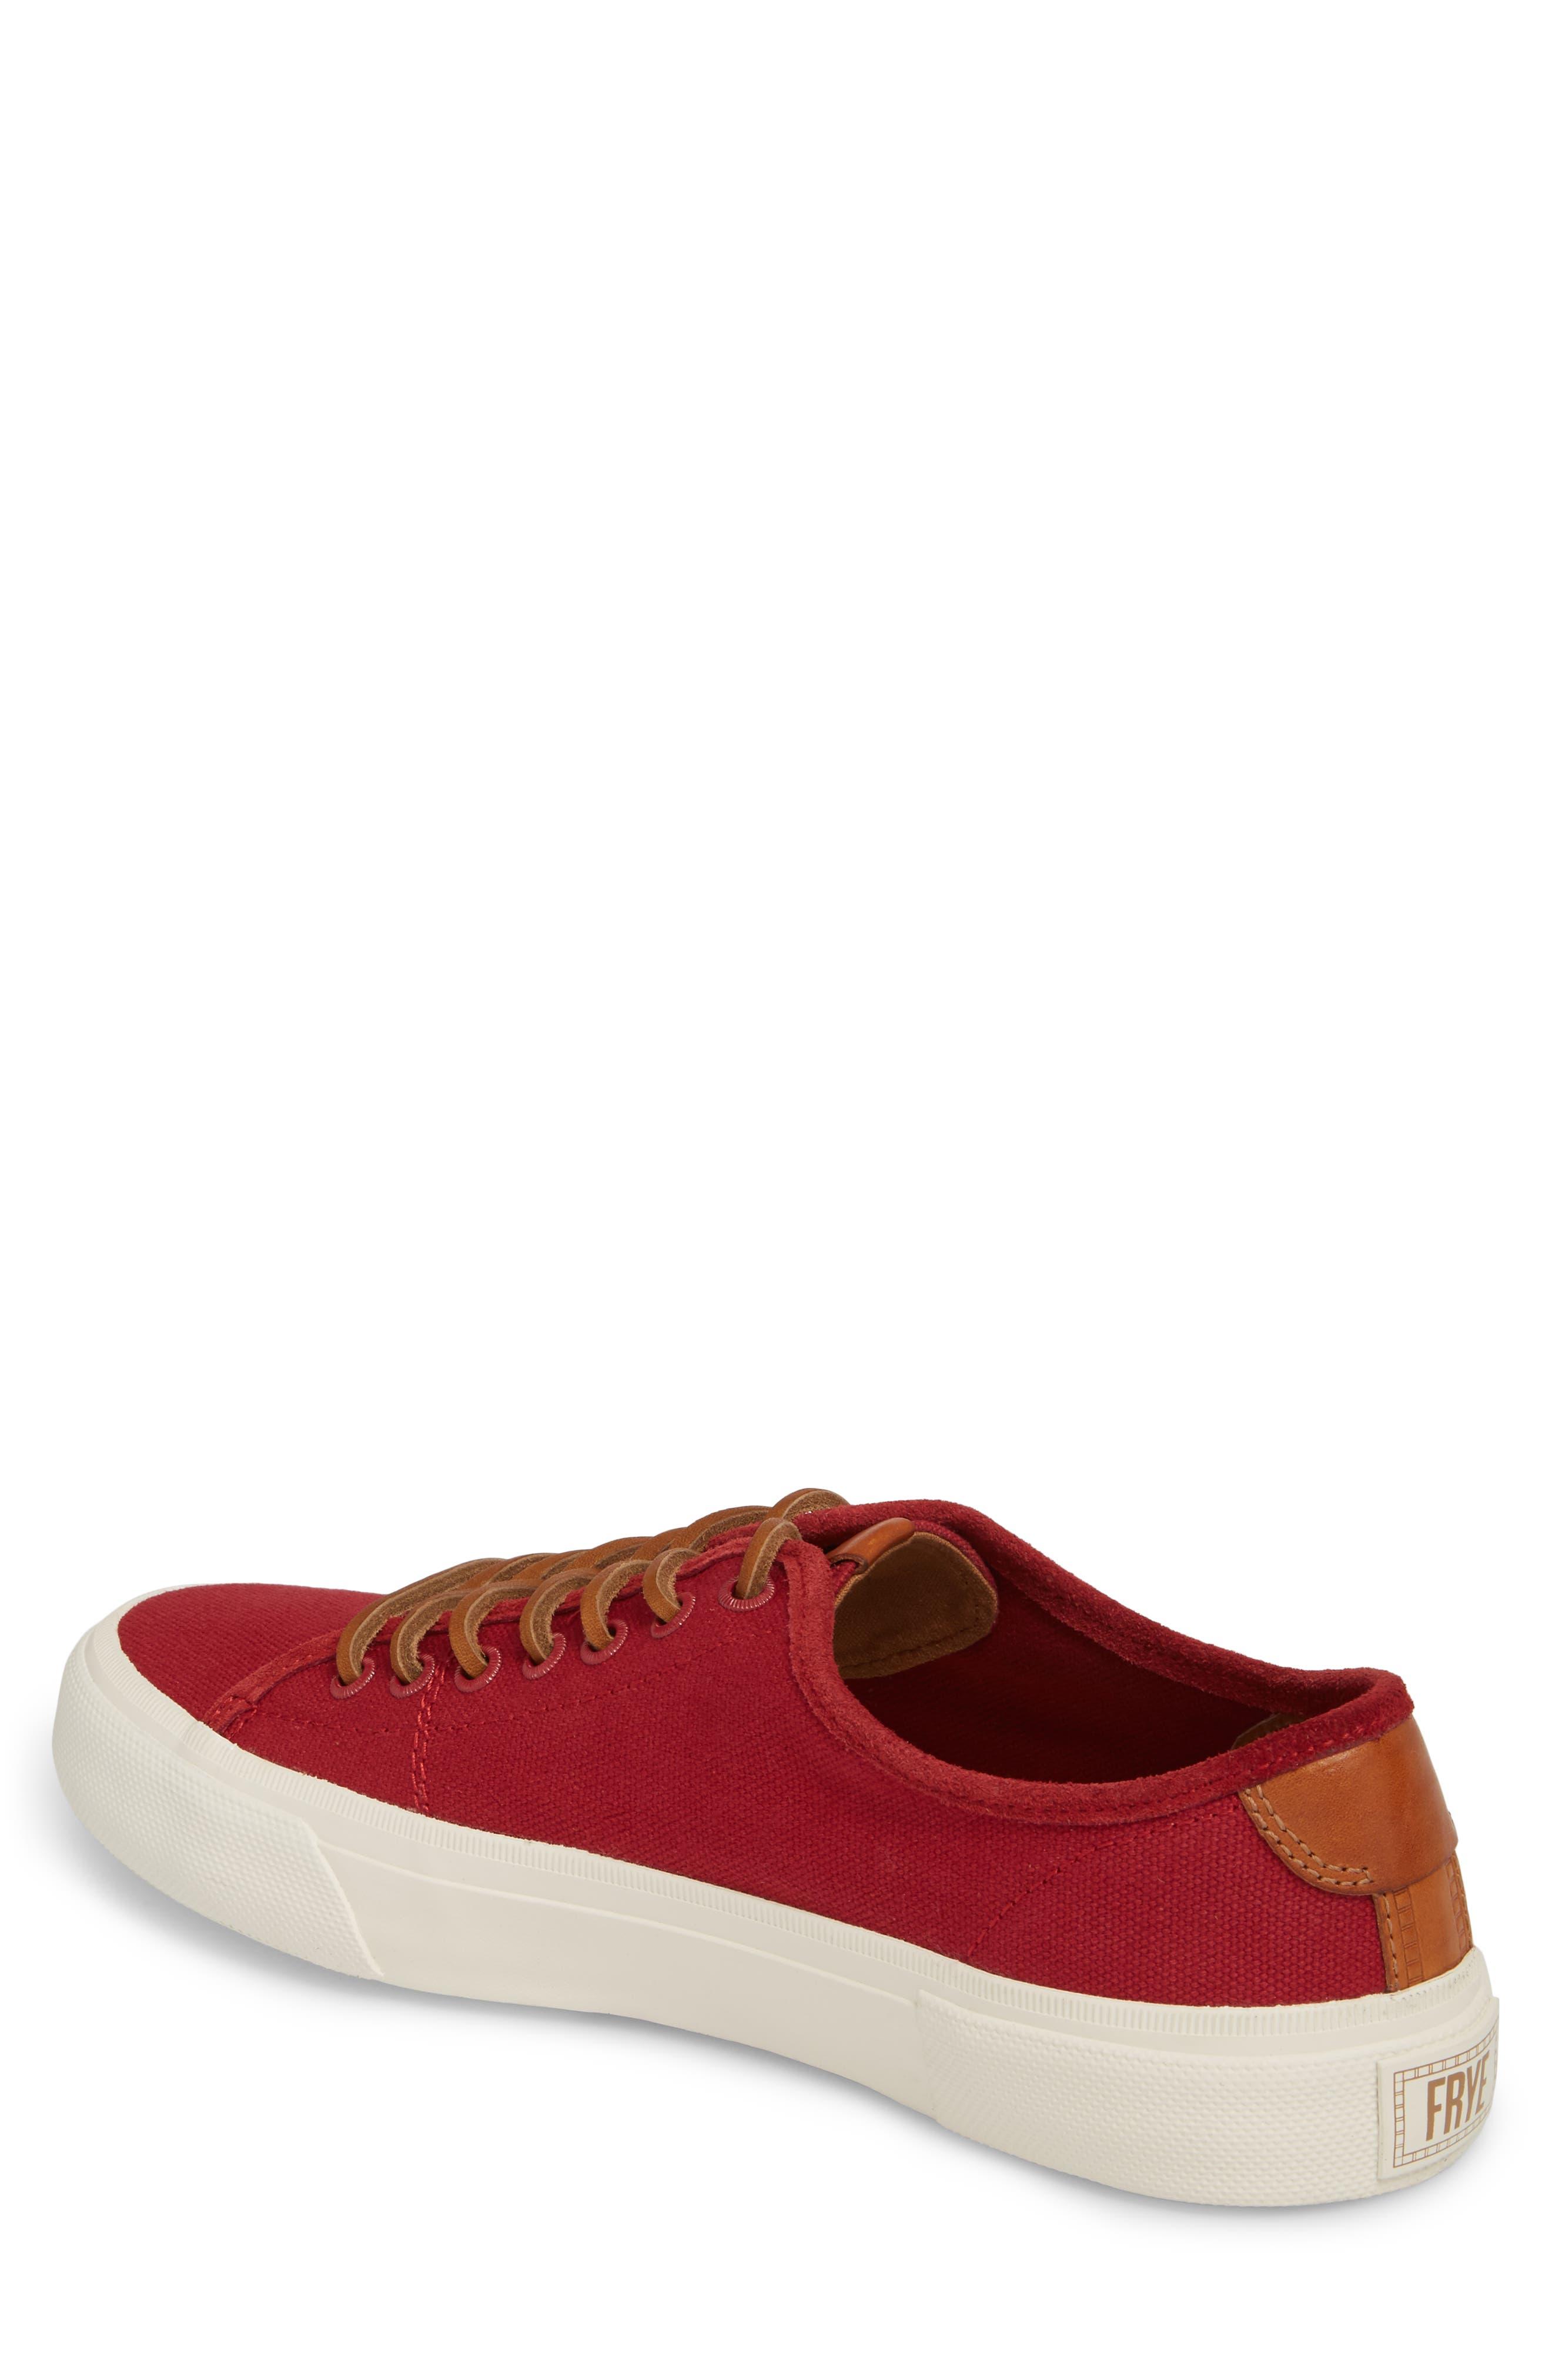 Alternate Image 2  - Frye Ludlow Low Top Sneaker (Men)